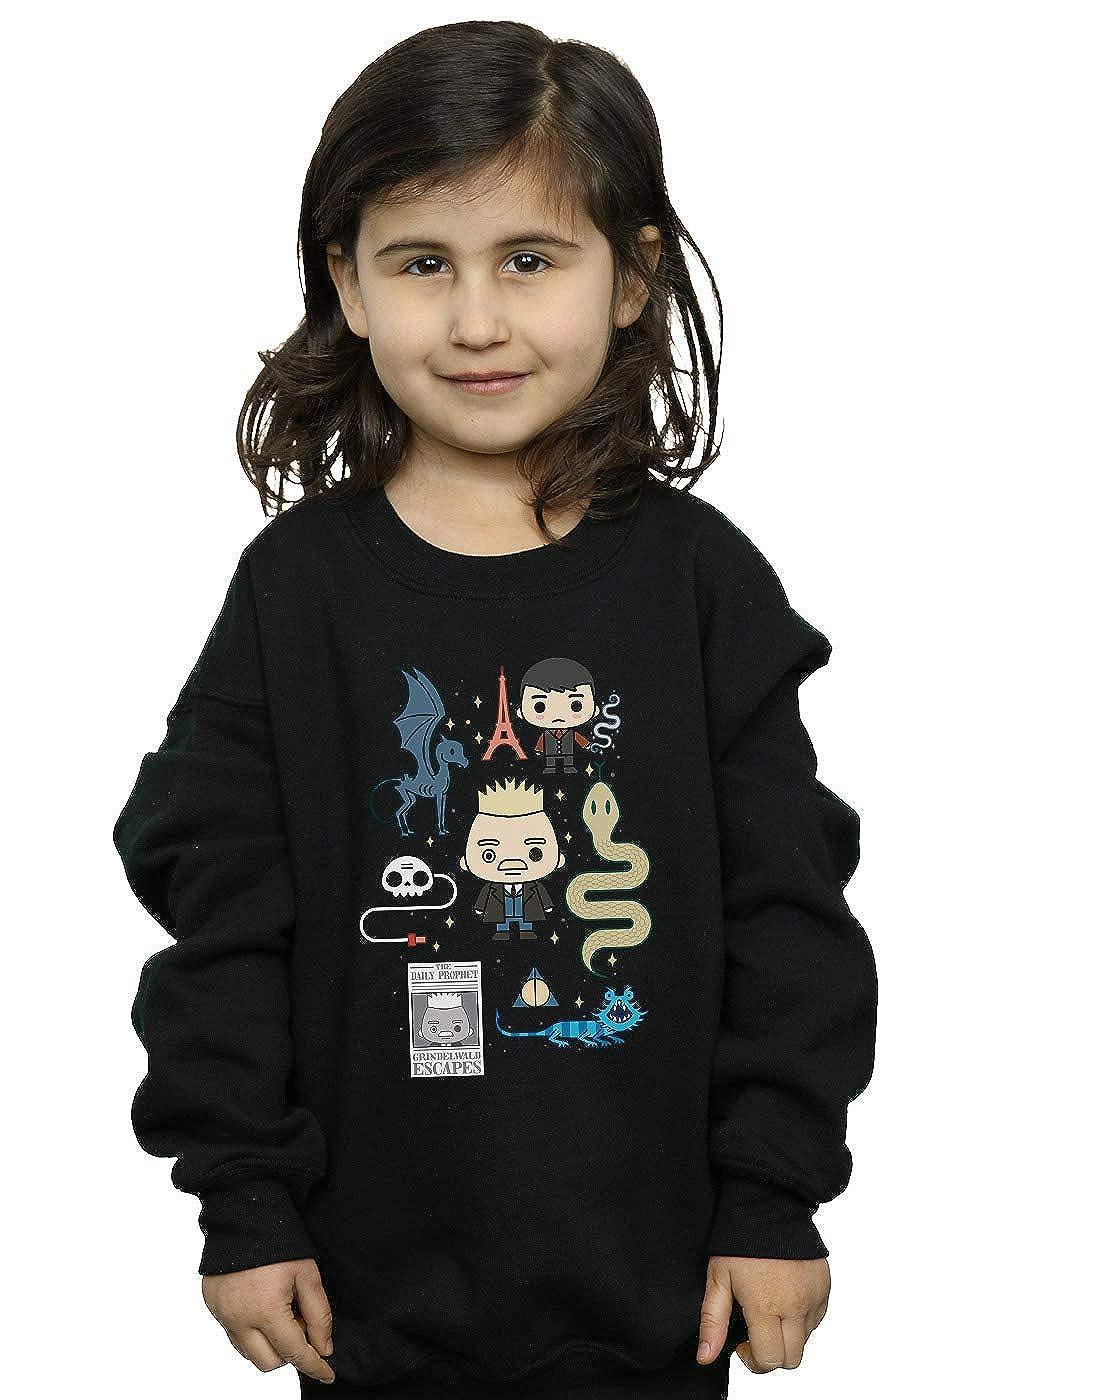 Absolute Cult Fantastic Beasts 2 Girls Chibi Grindelwald Sweatshirt